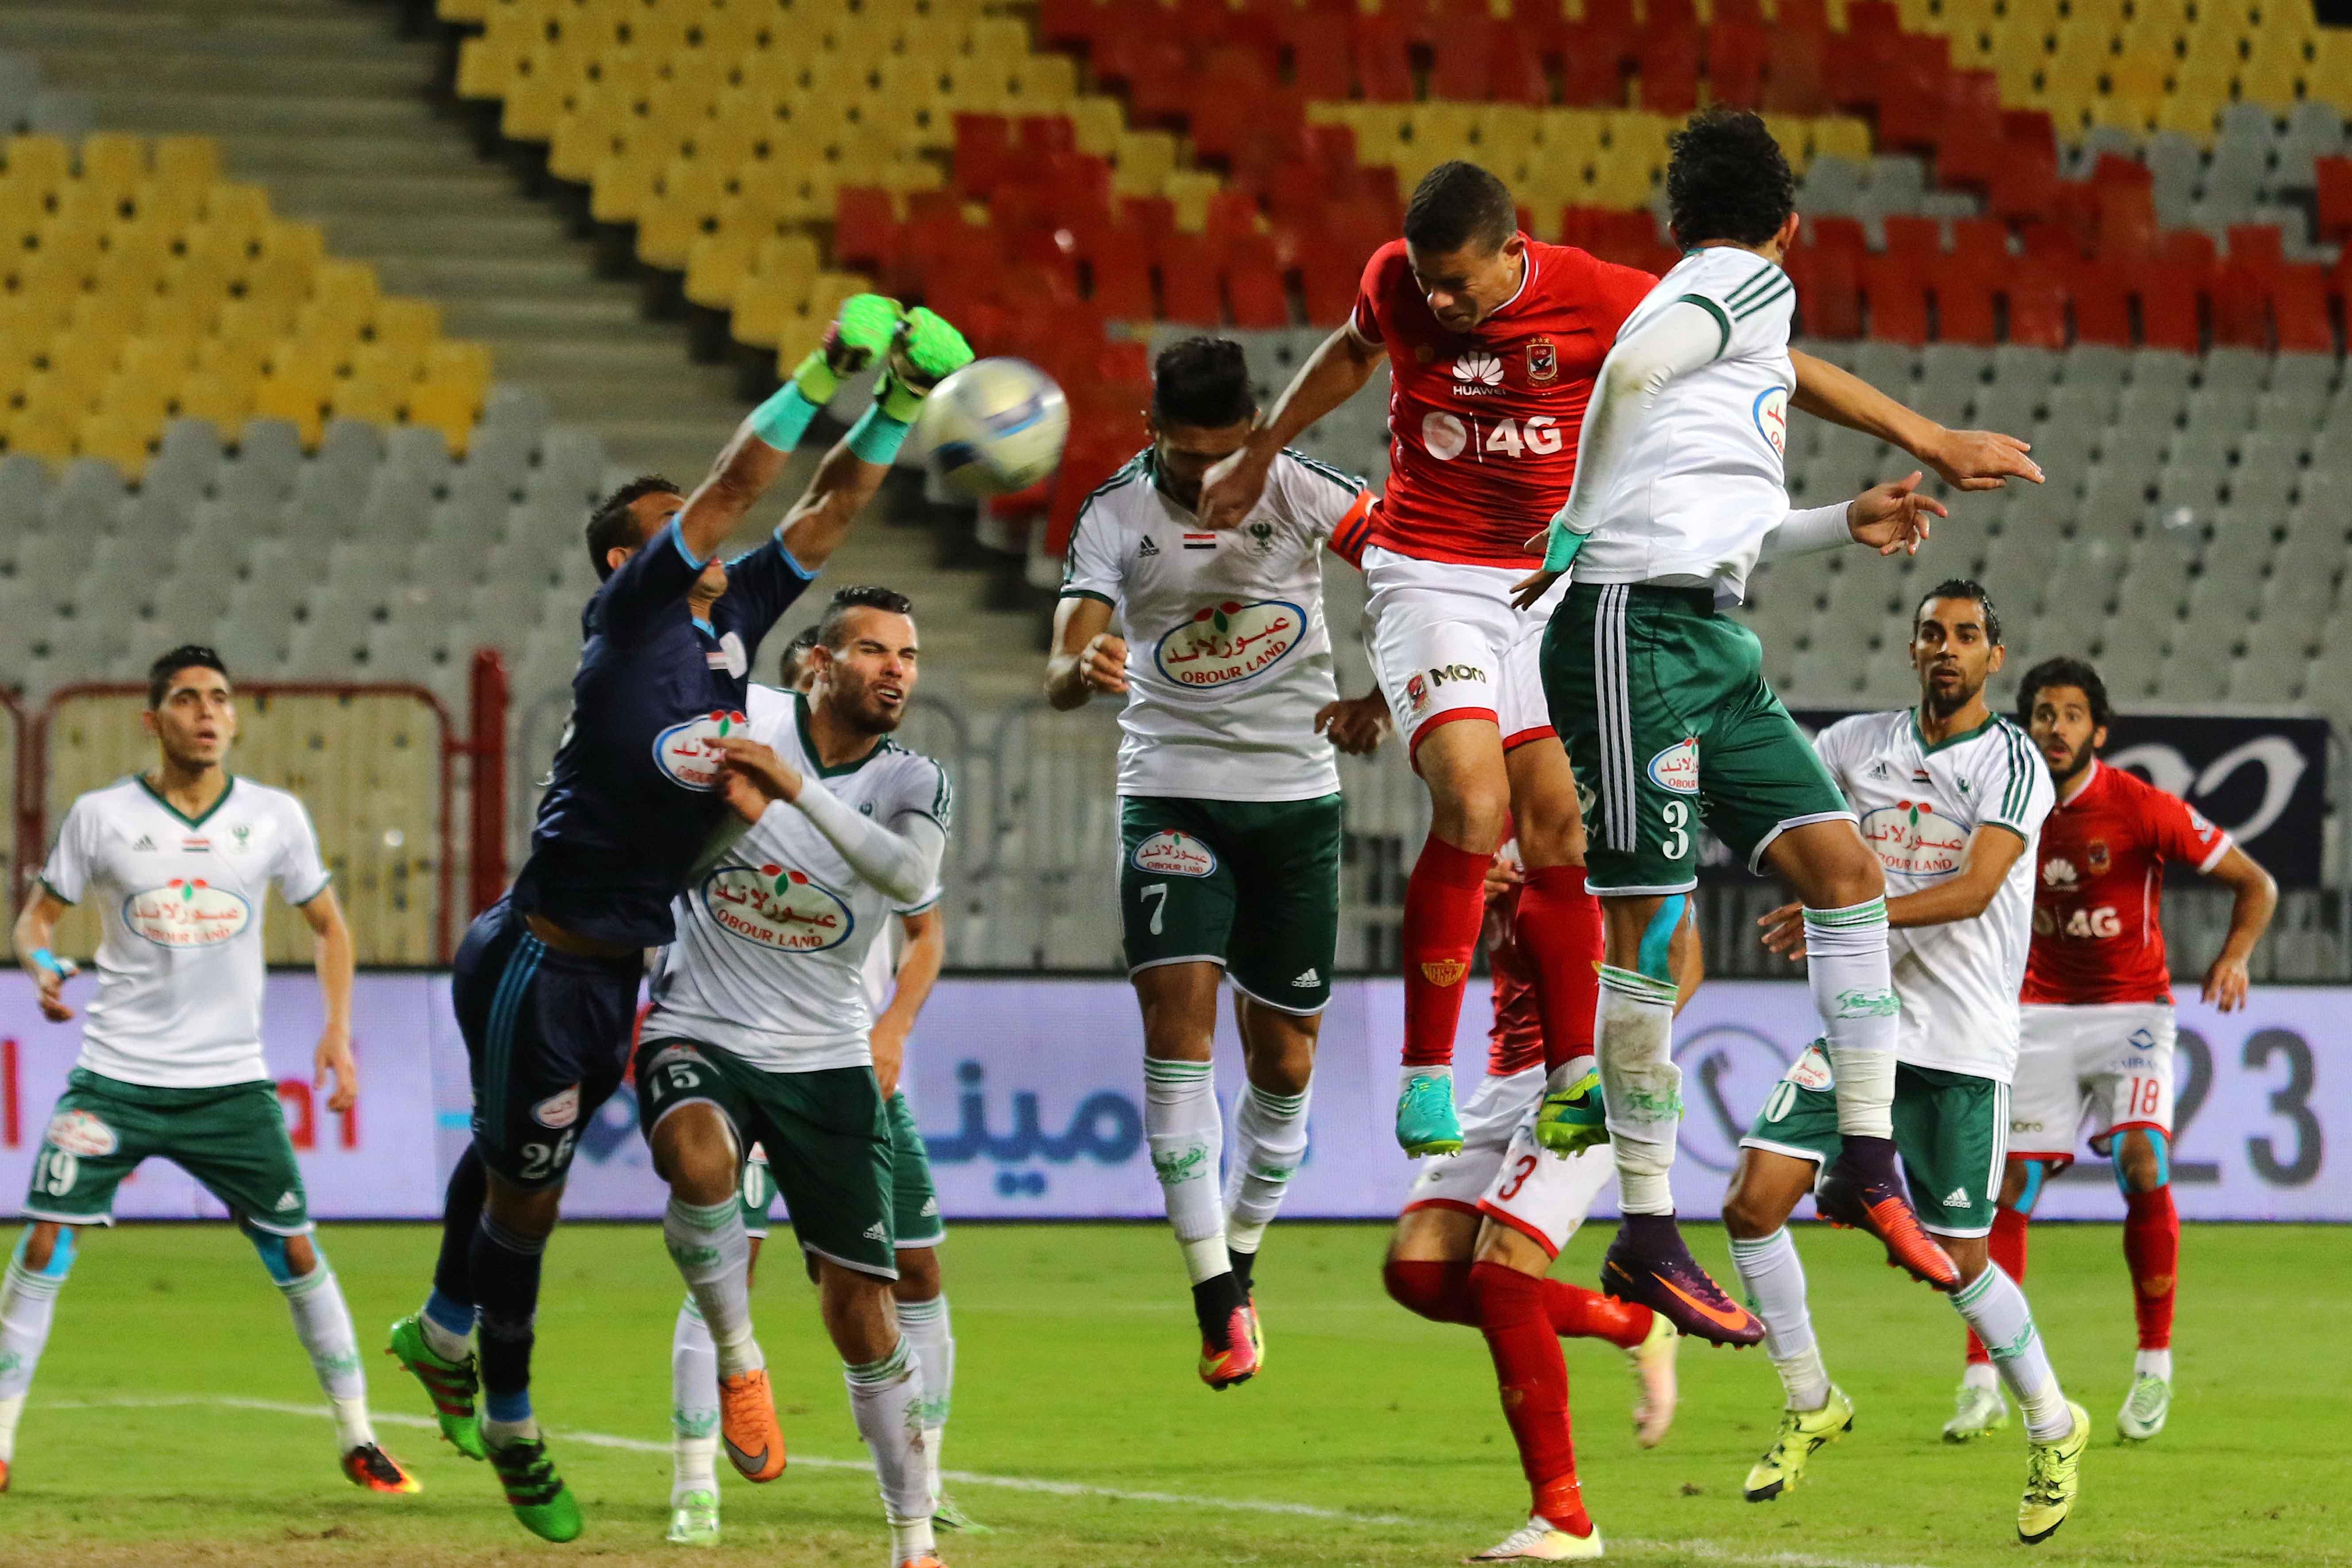 Al Ahly vs Almasry - 18-12-2016